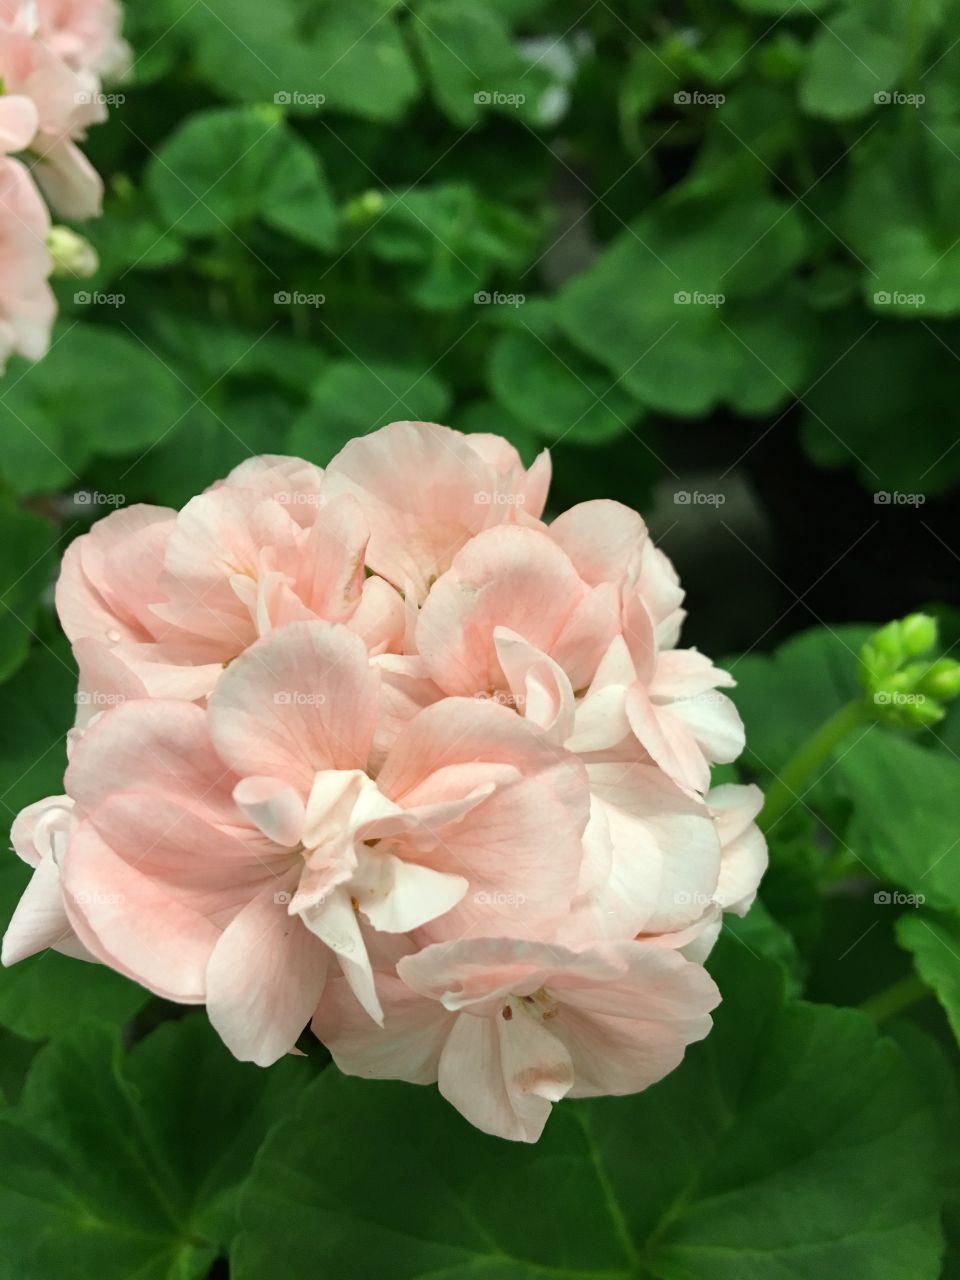 Pale blossom